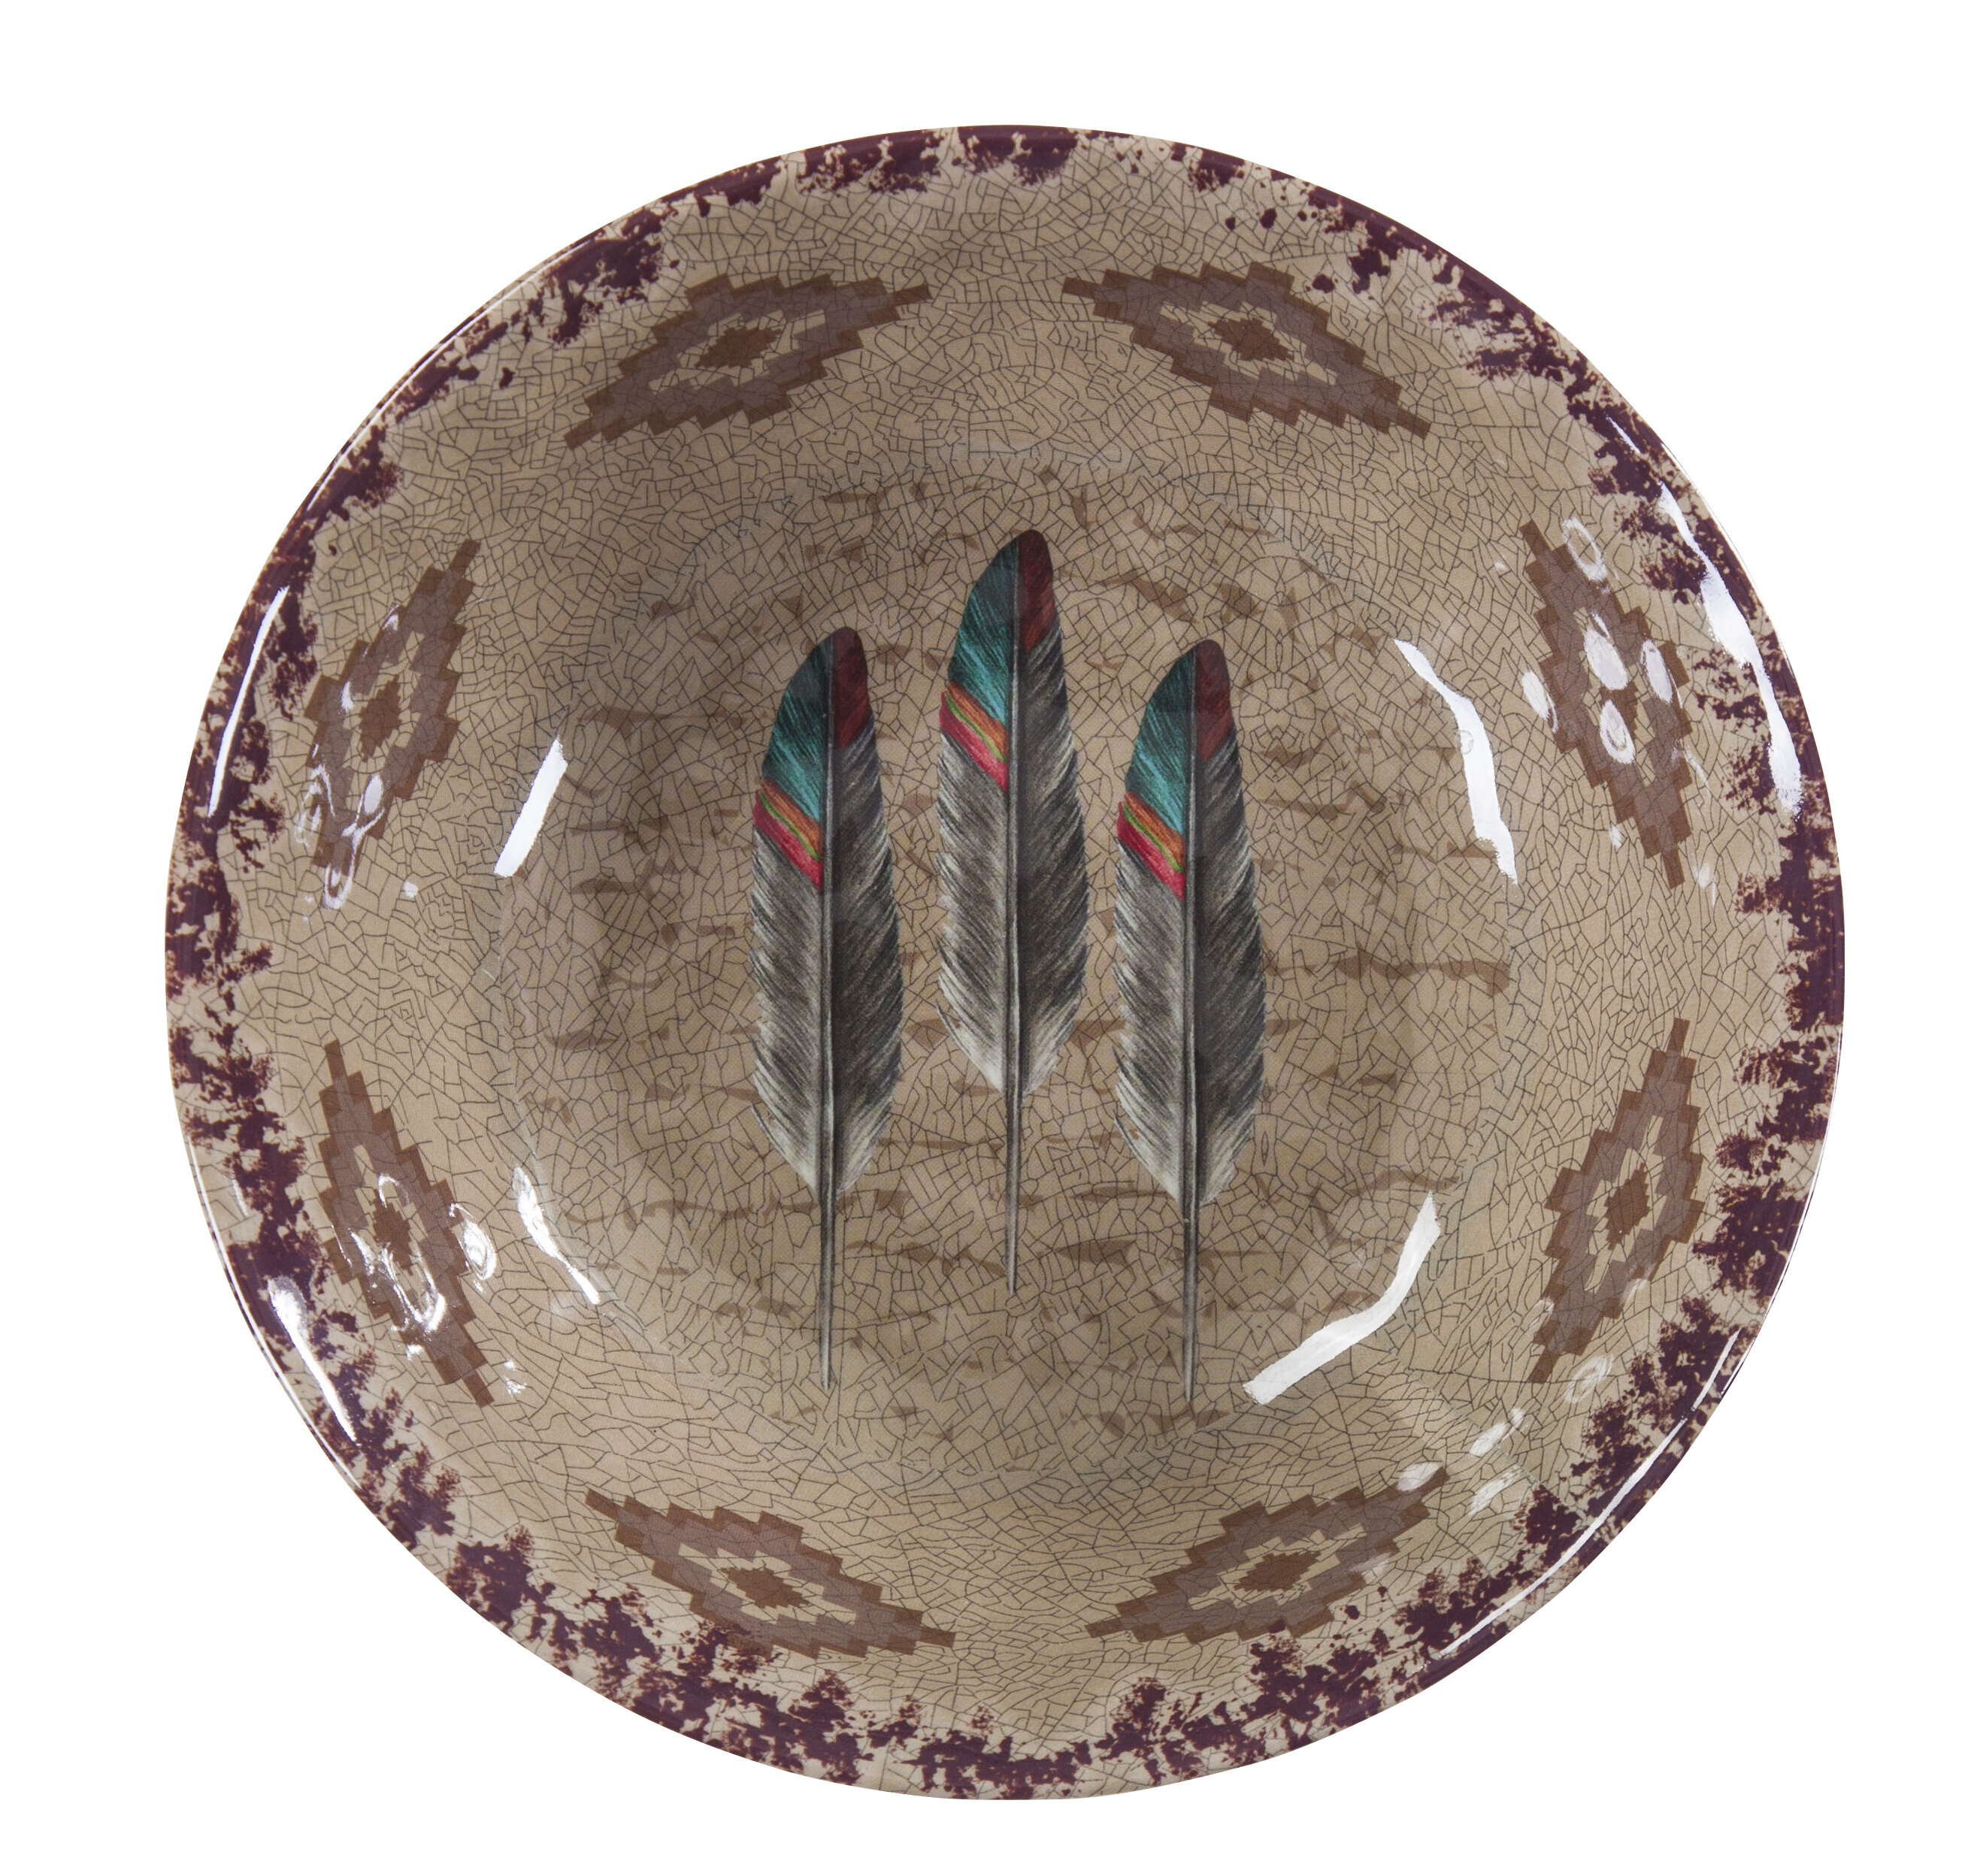 East Urban Home Feather Melamine Dining Bowl Reviews Wayfair Ca